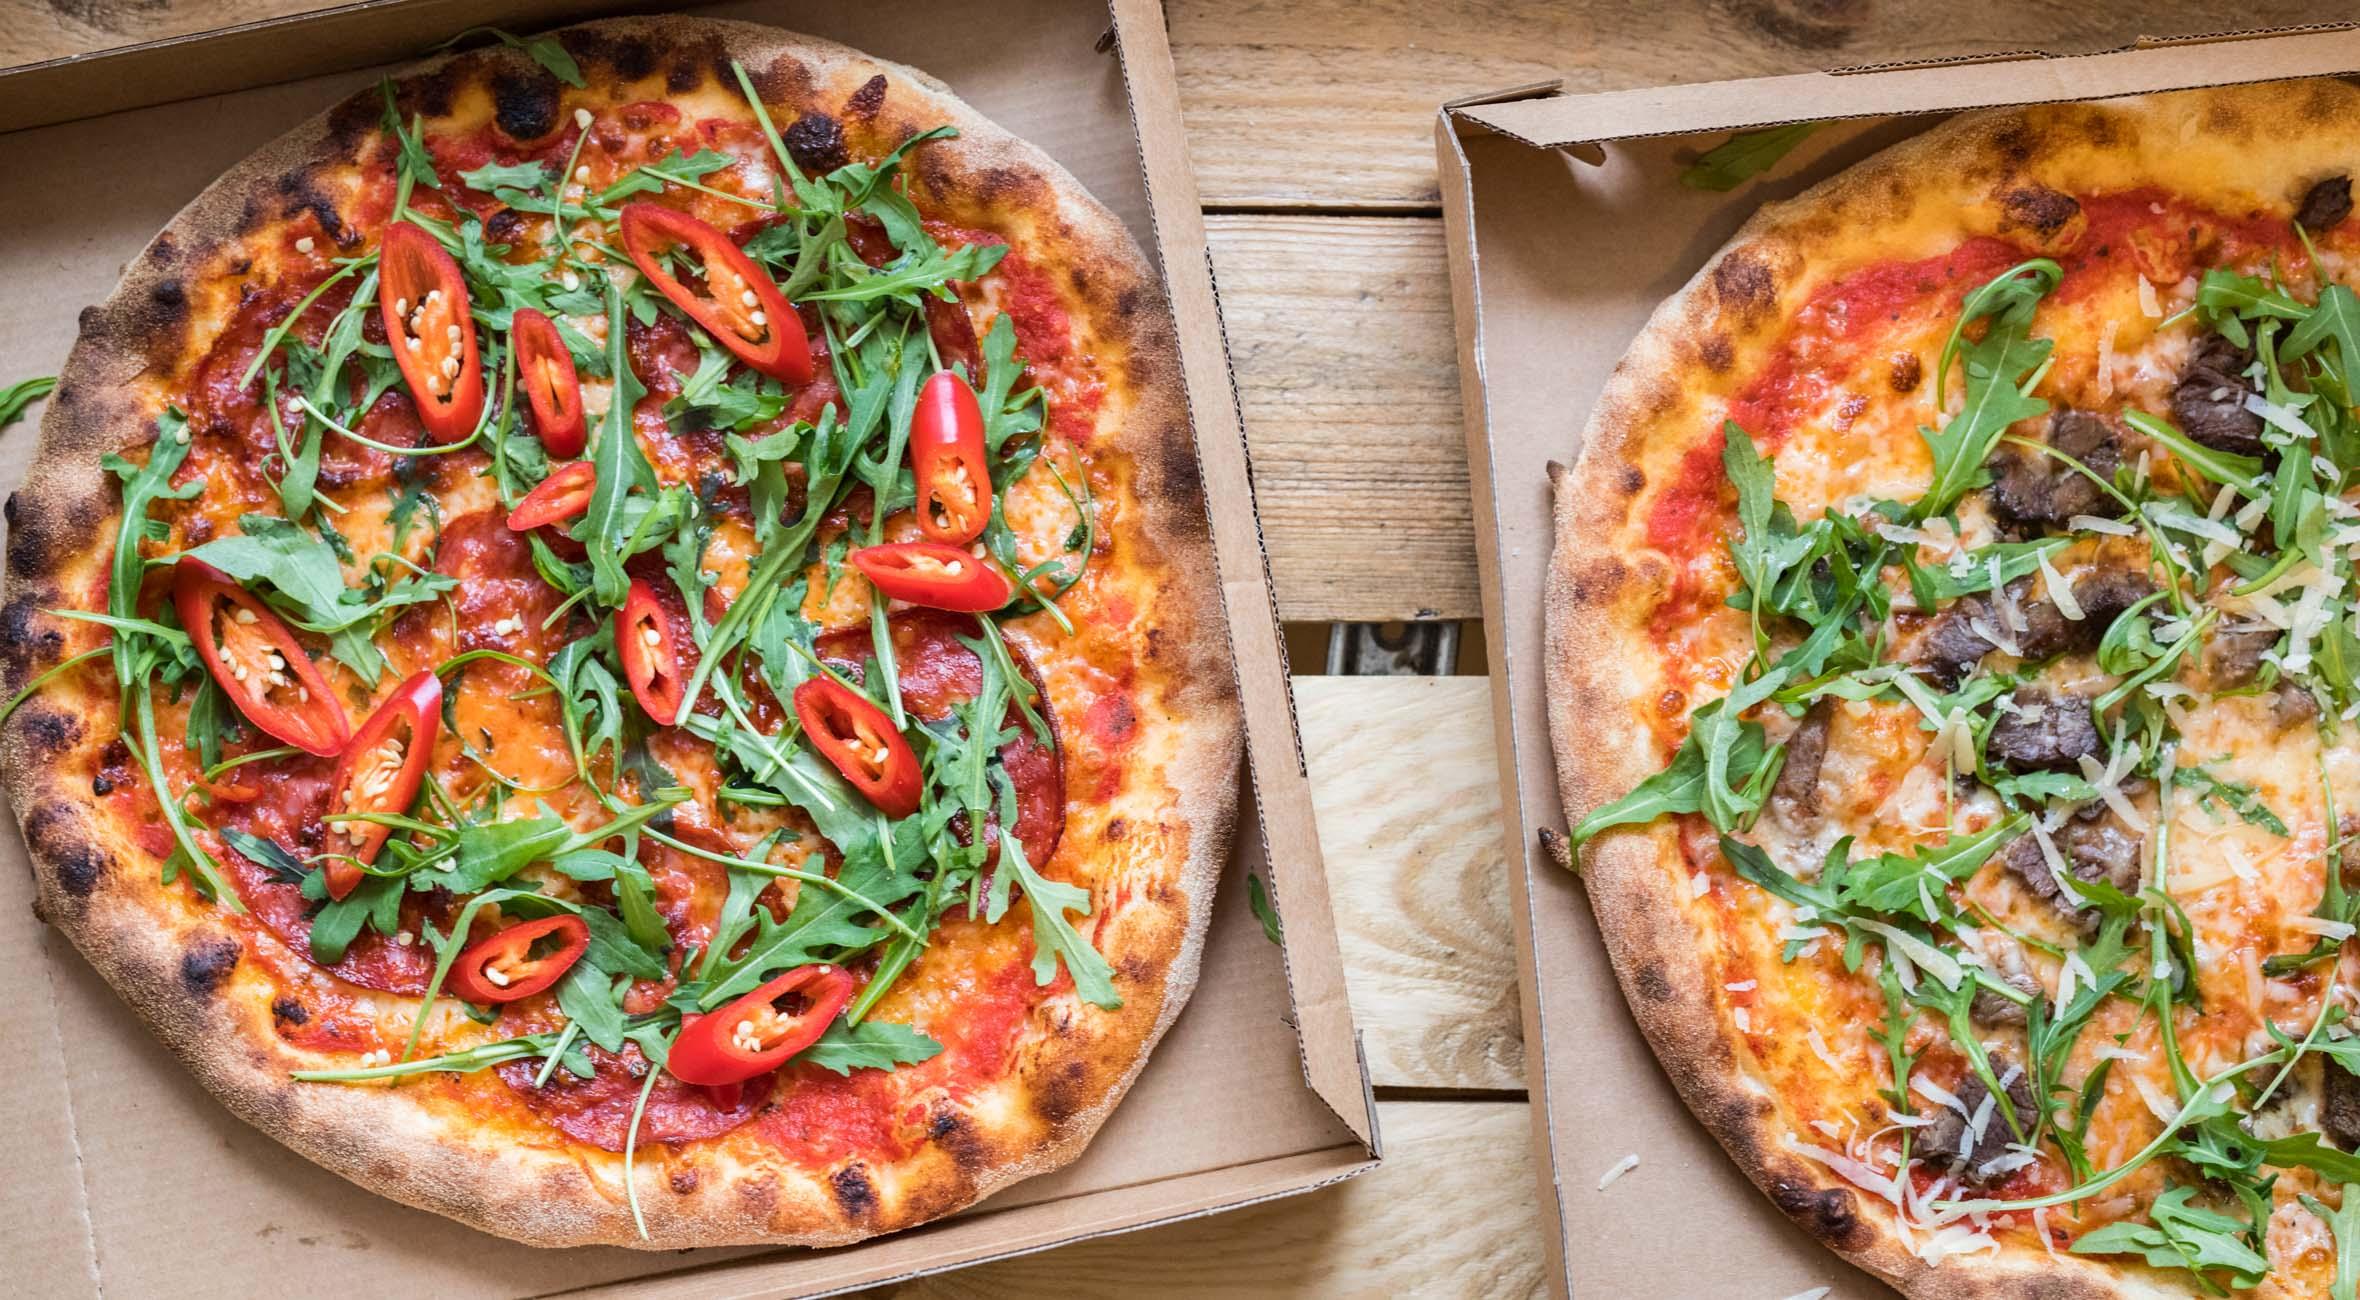 2 x pizza hos Pz Nordic ved Torvehallerne – Michelin-kok & italiensk pizzabager byder på byens vildeste pizzaer